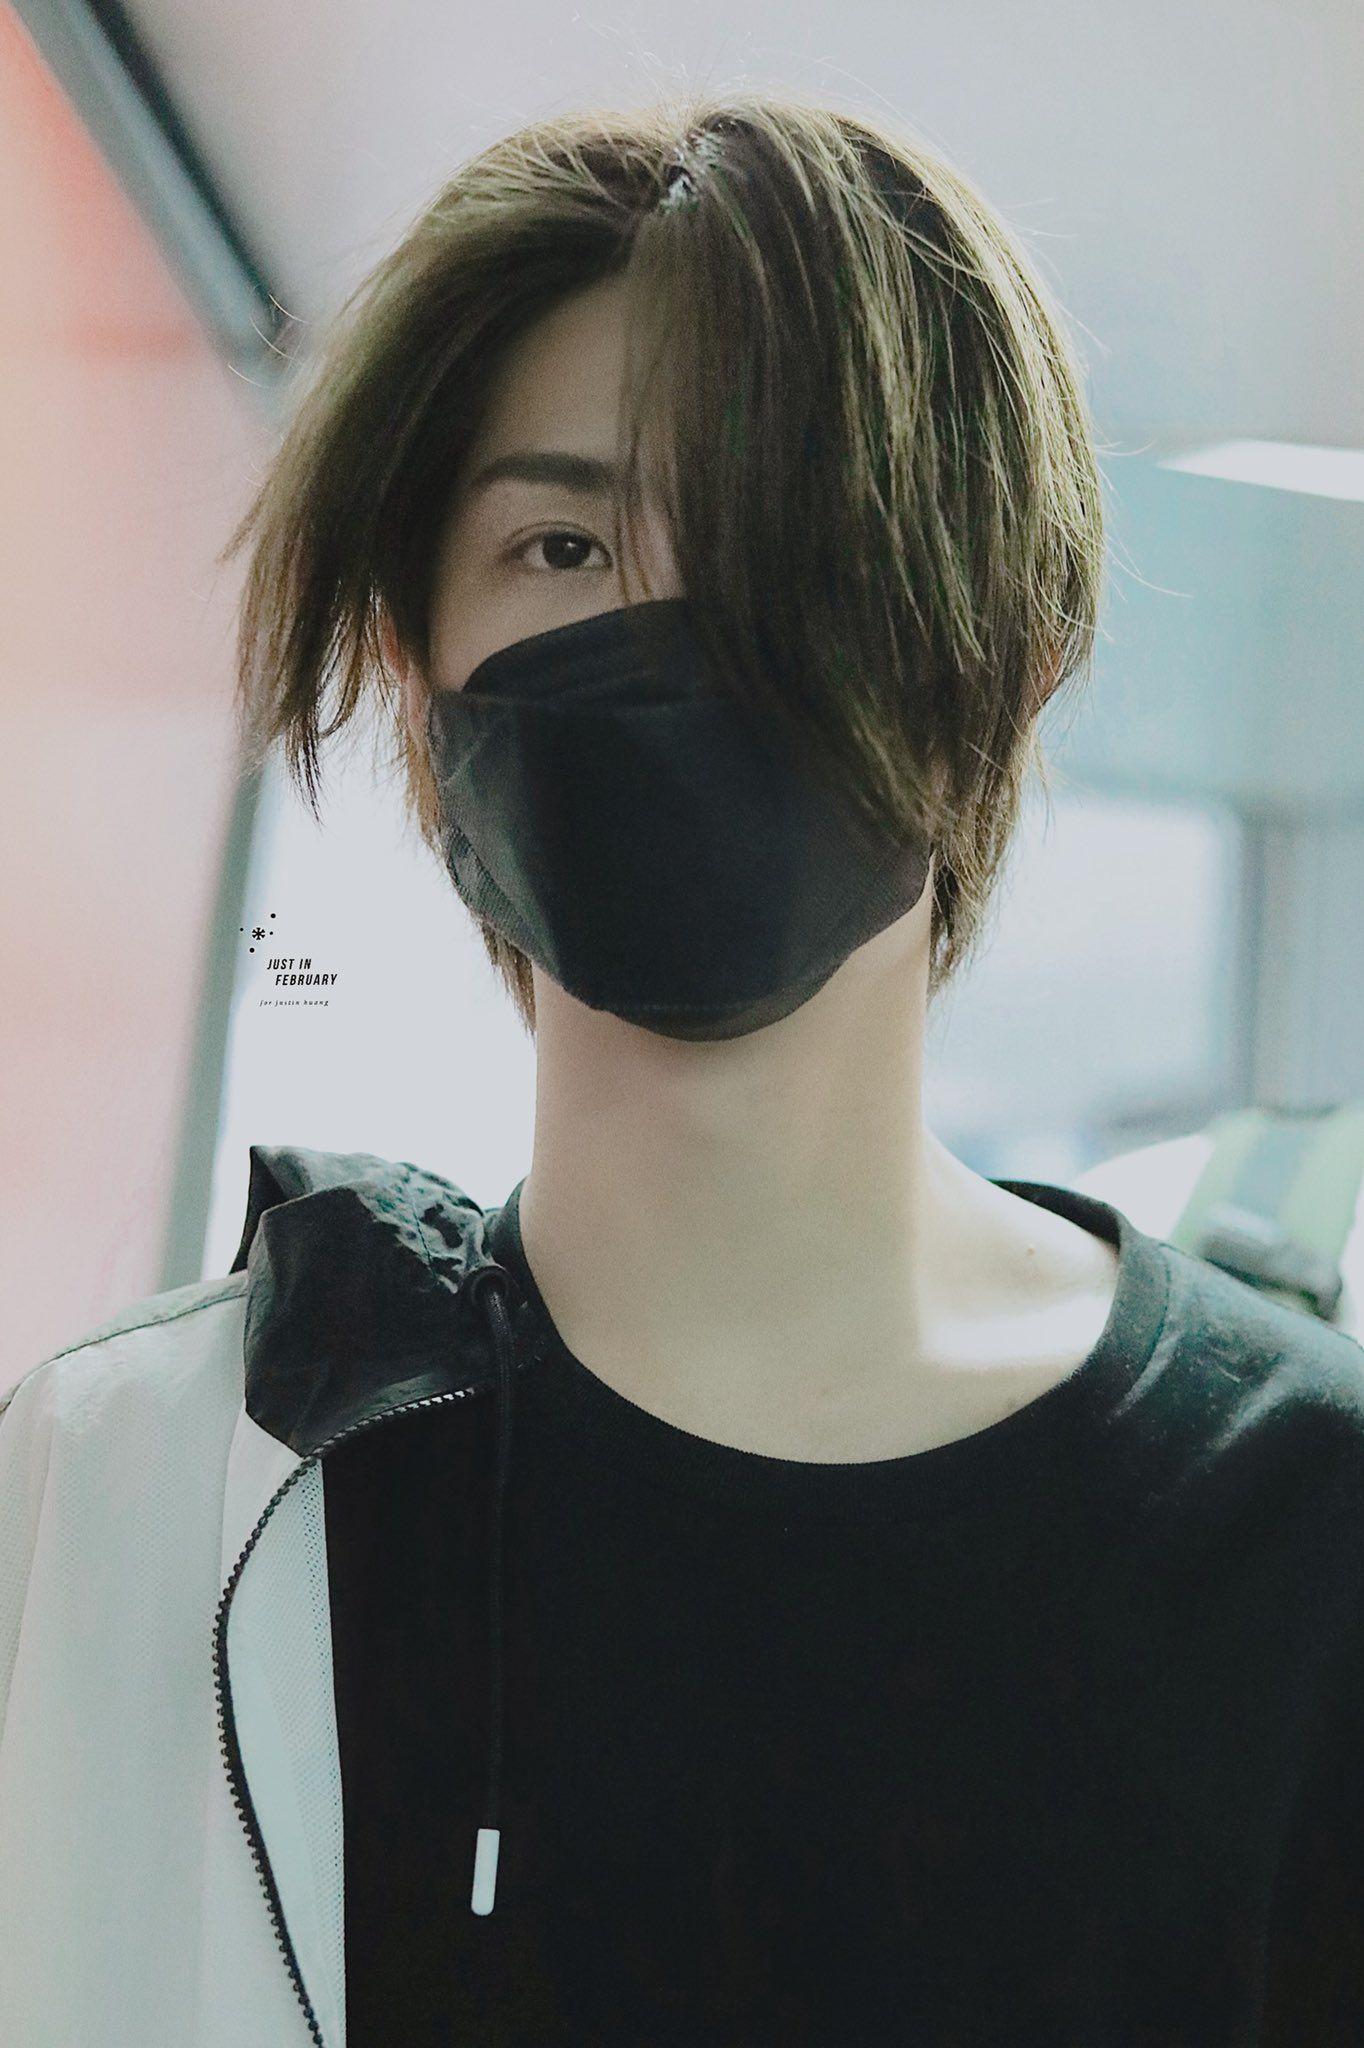 Twitter In 2020 Long Hair Styles Men Boys Long Hairstyles Asian Men Long Hair